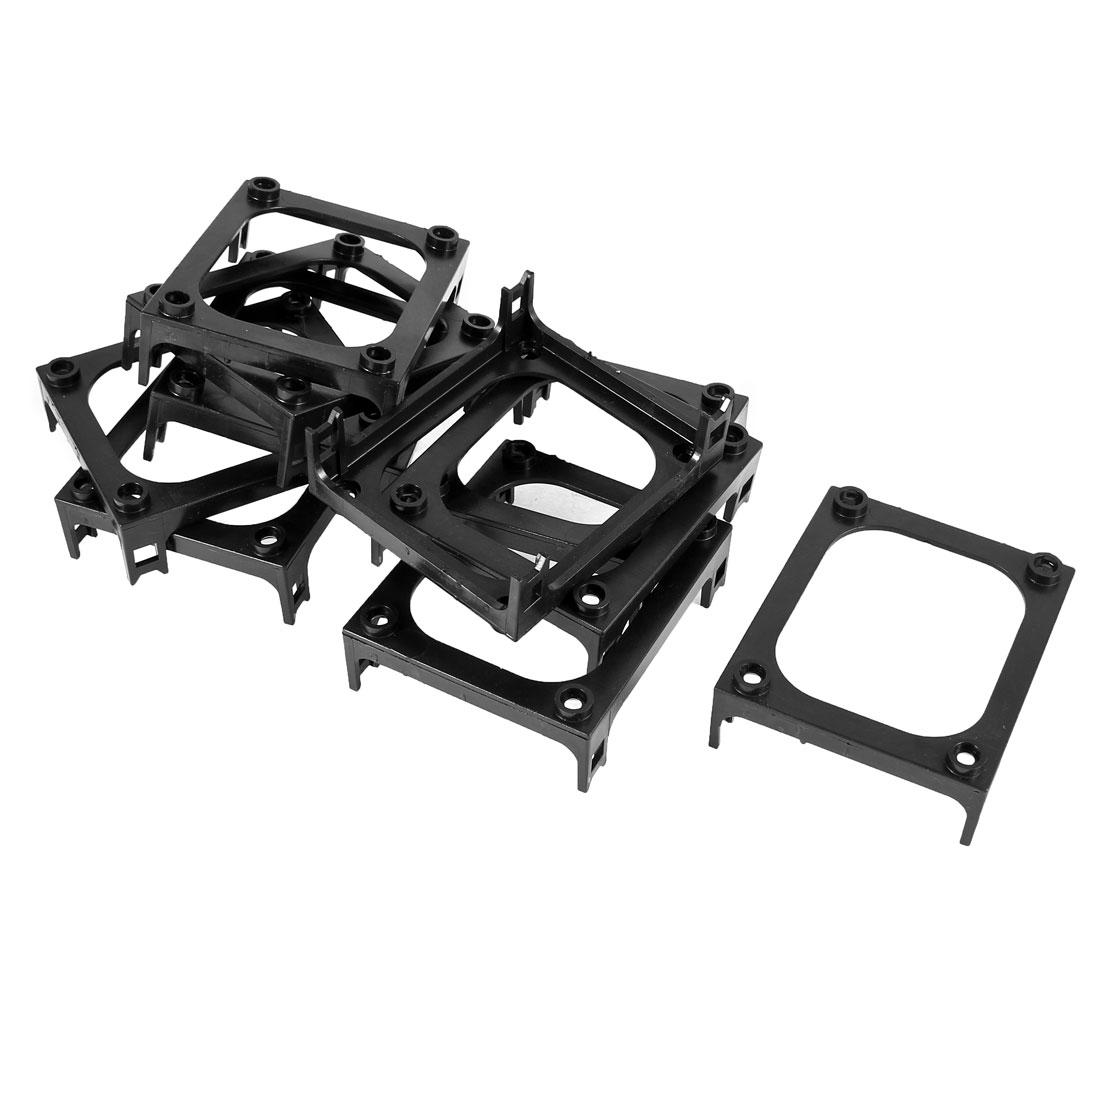 10 Pieces Retention Bracket Module Holder Black for Intel P4 Socket 478 Heatsink